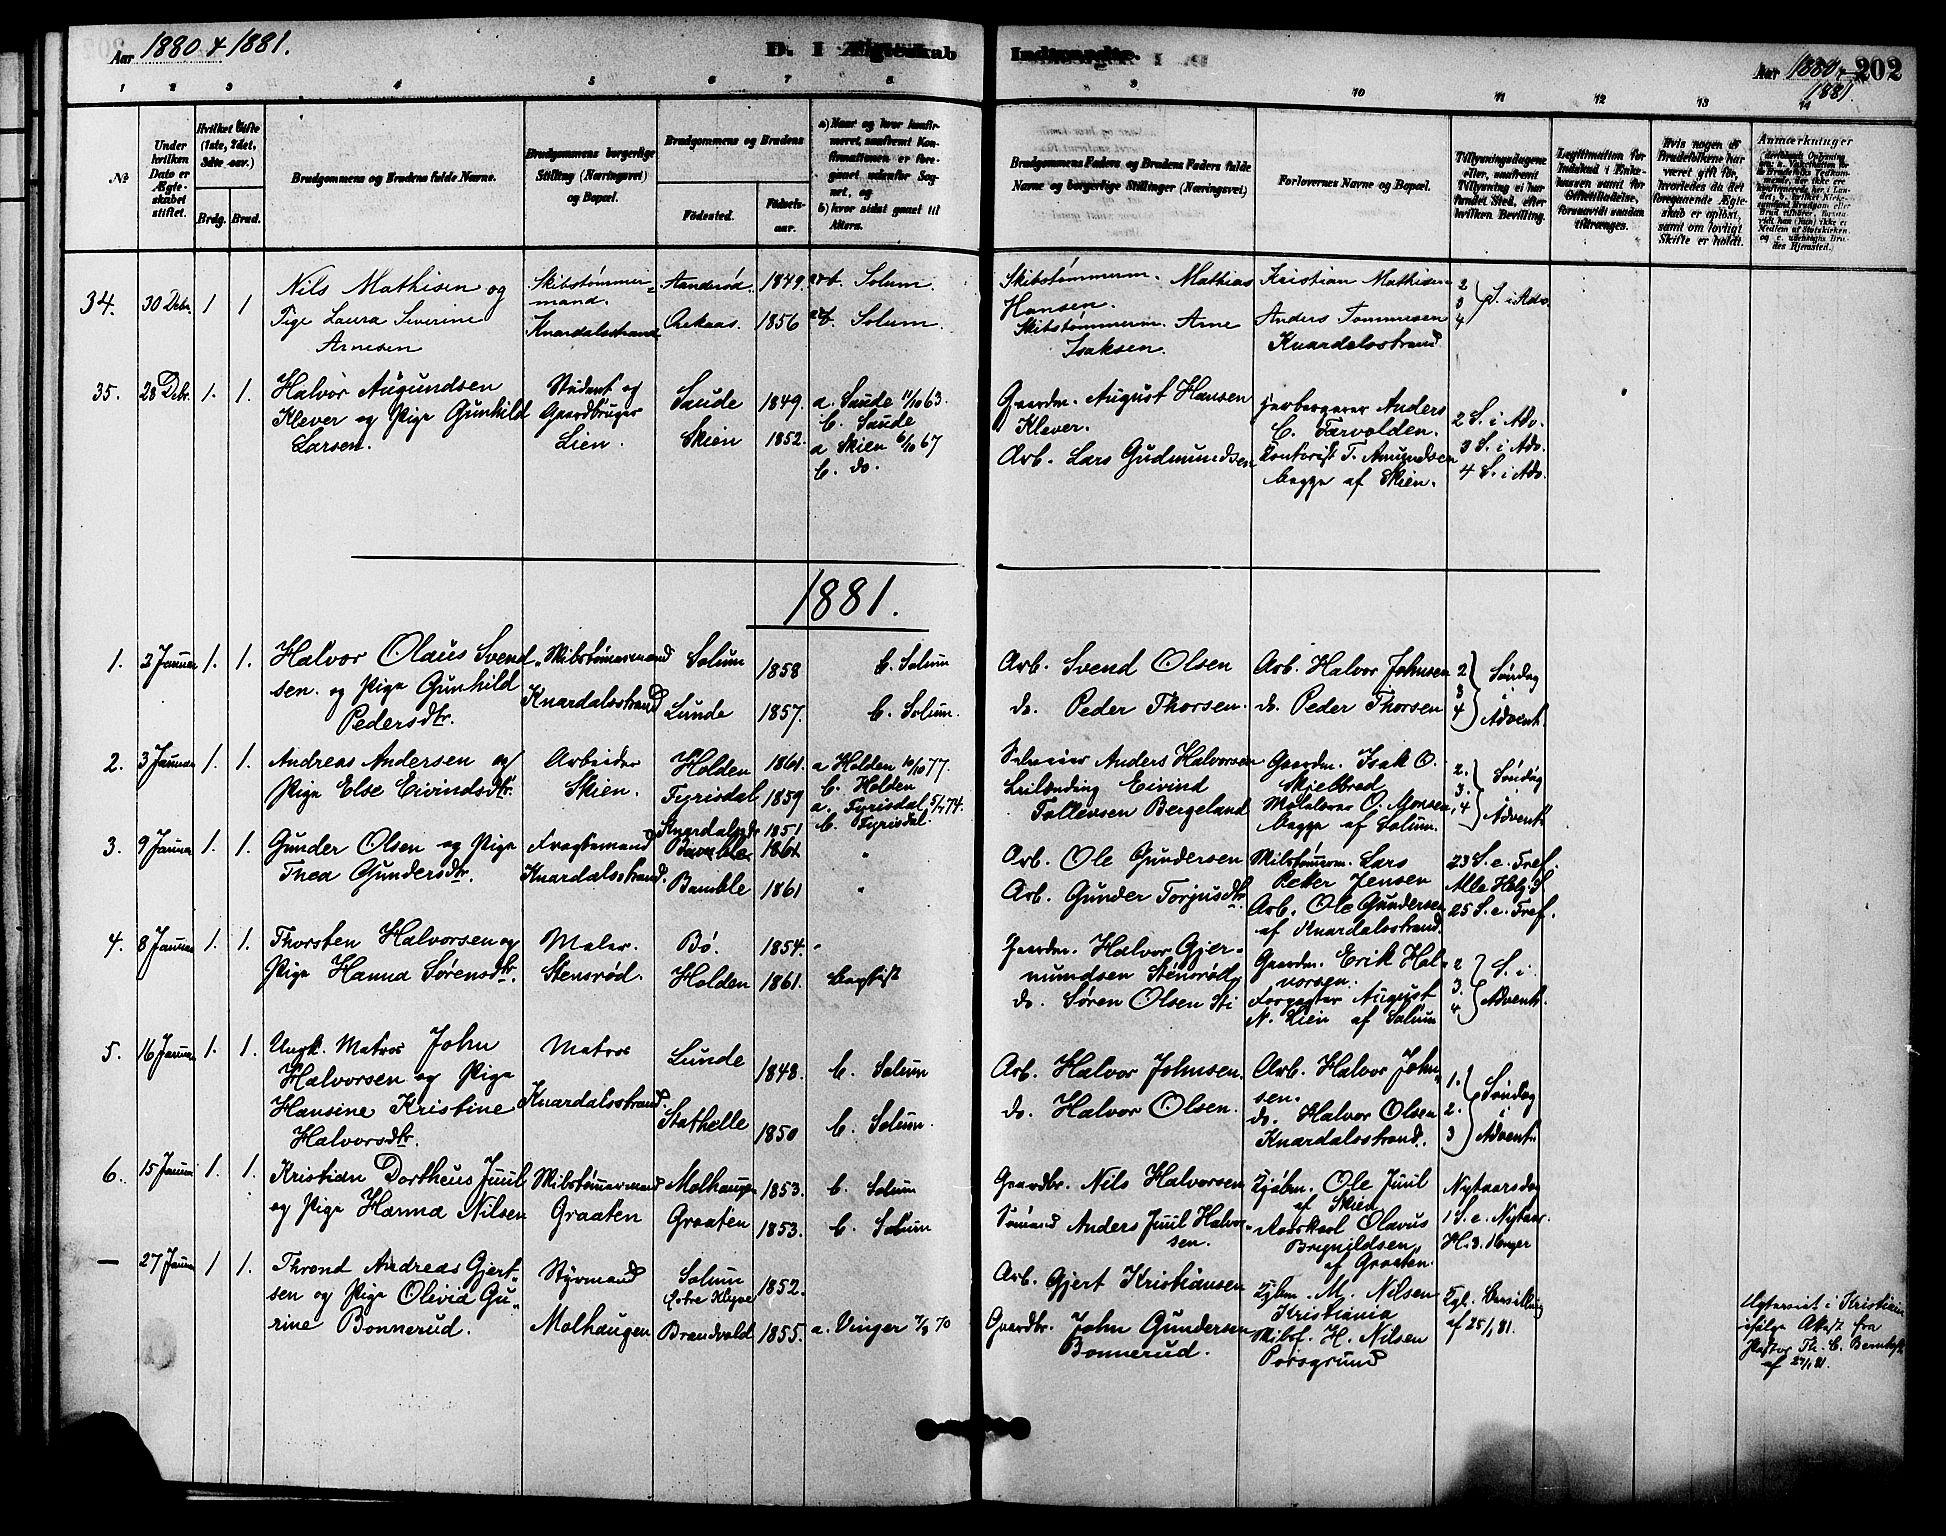 SAKO, Solum kirkebøker, F/Fa/L0009: Ministerialbok nr. I 9, 1877-1887, s. 202